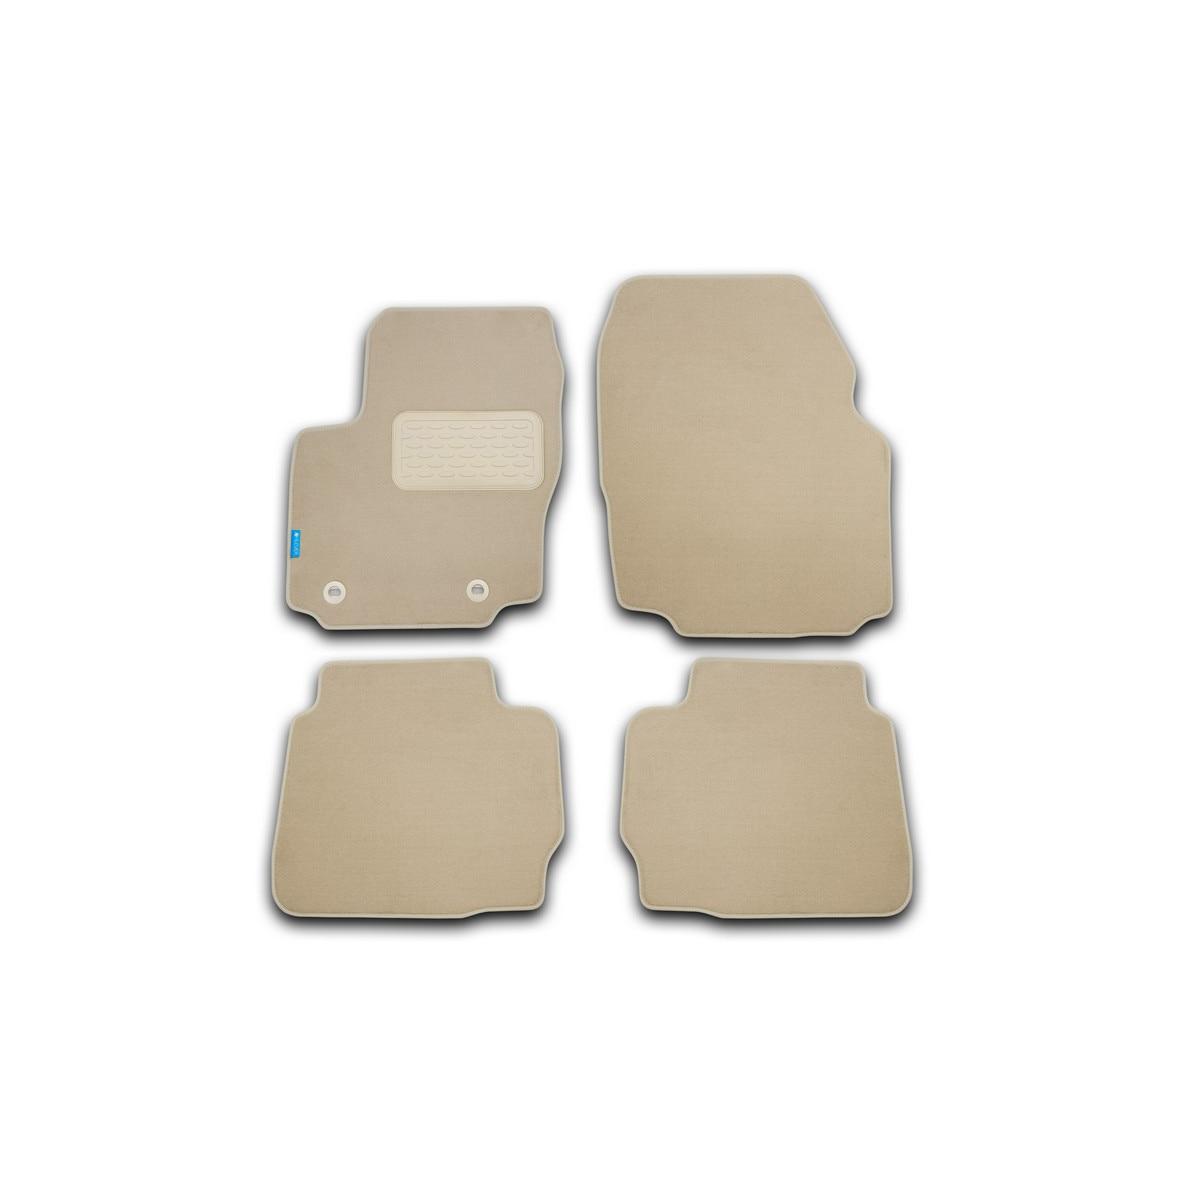 Floor mats for Kia opirus automatic 2003-2010, ETS. PC, beige